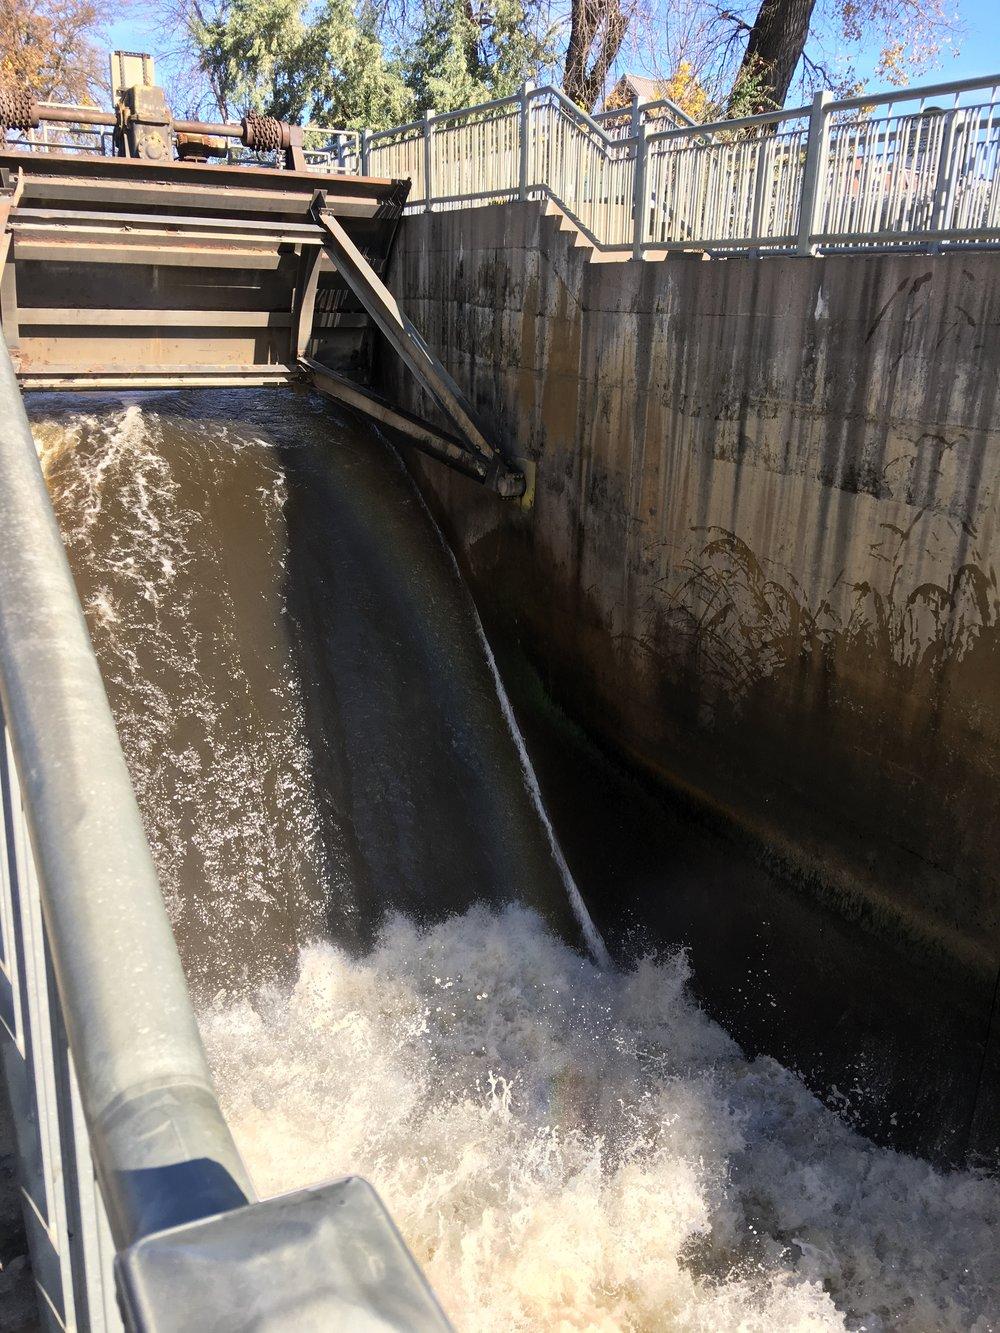 Water gushing through the open gate